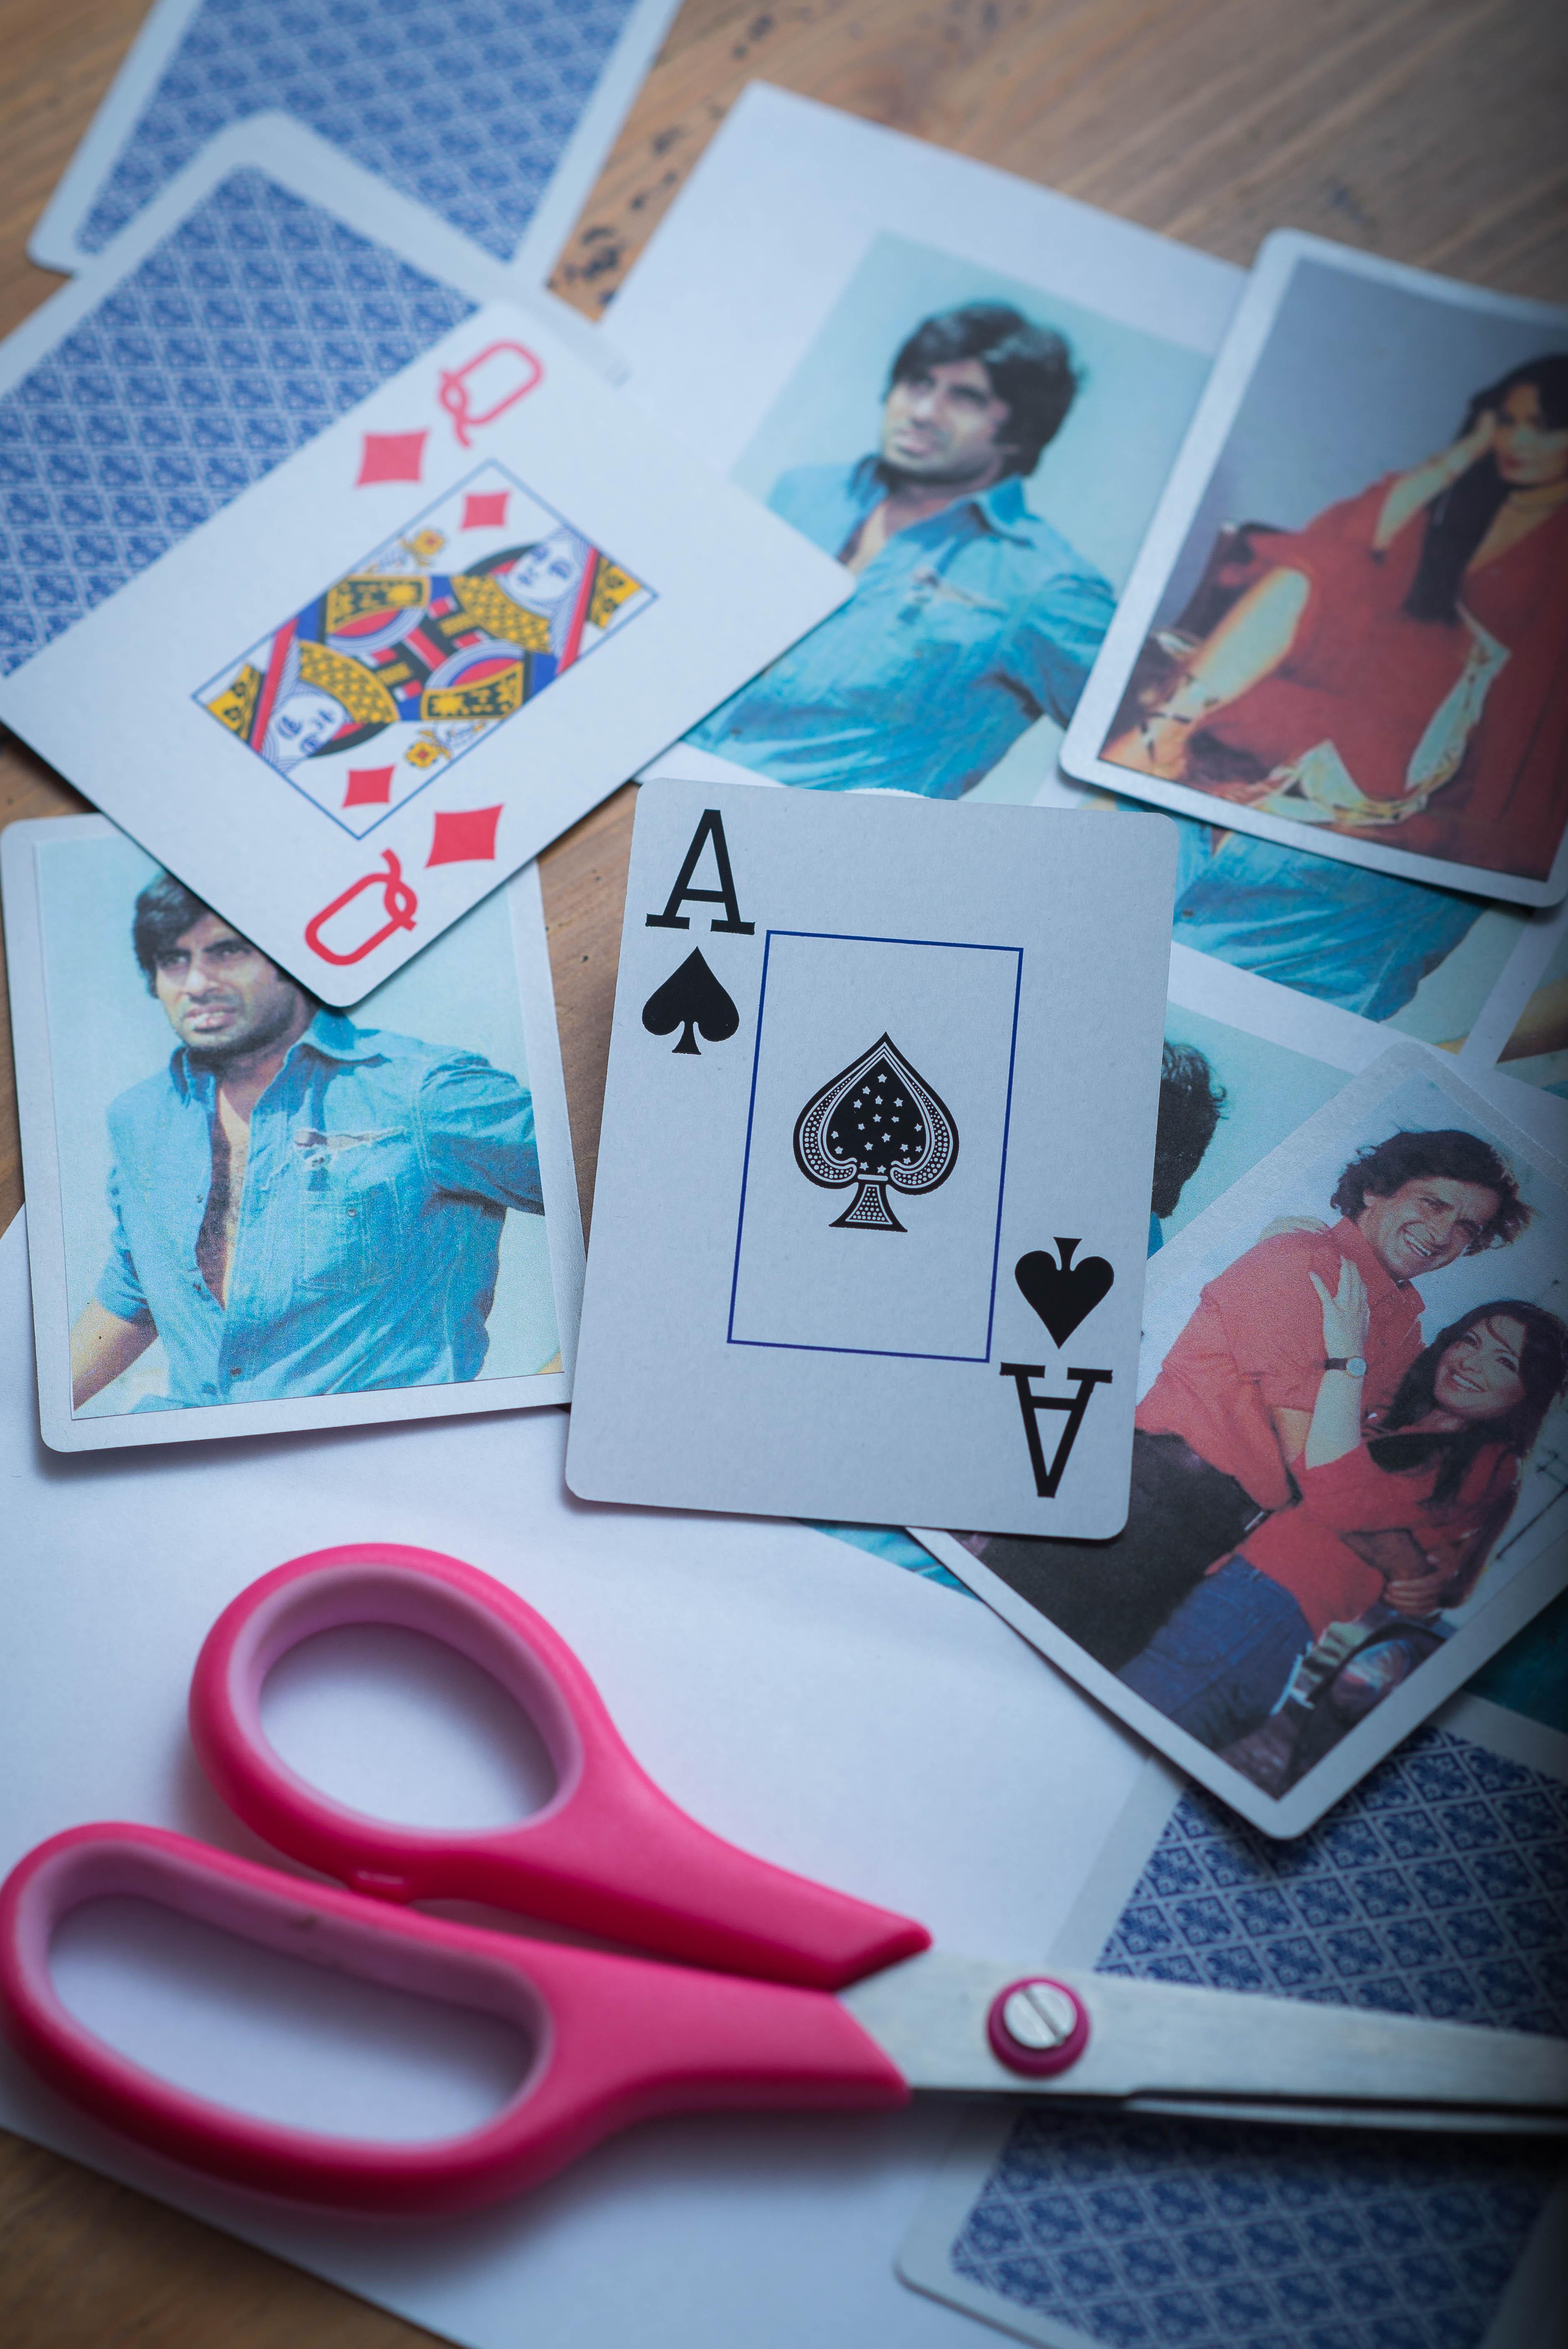 diy bollywood playing cards, diwali, pink chai